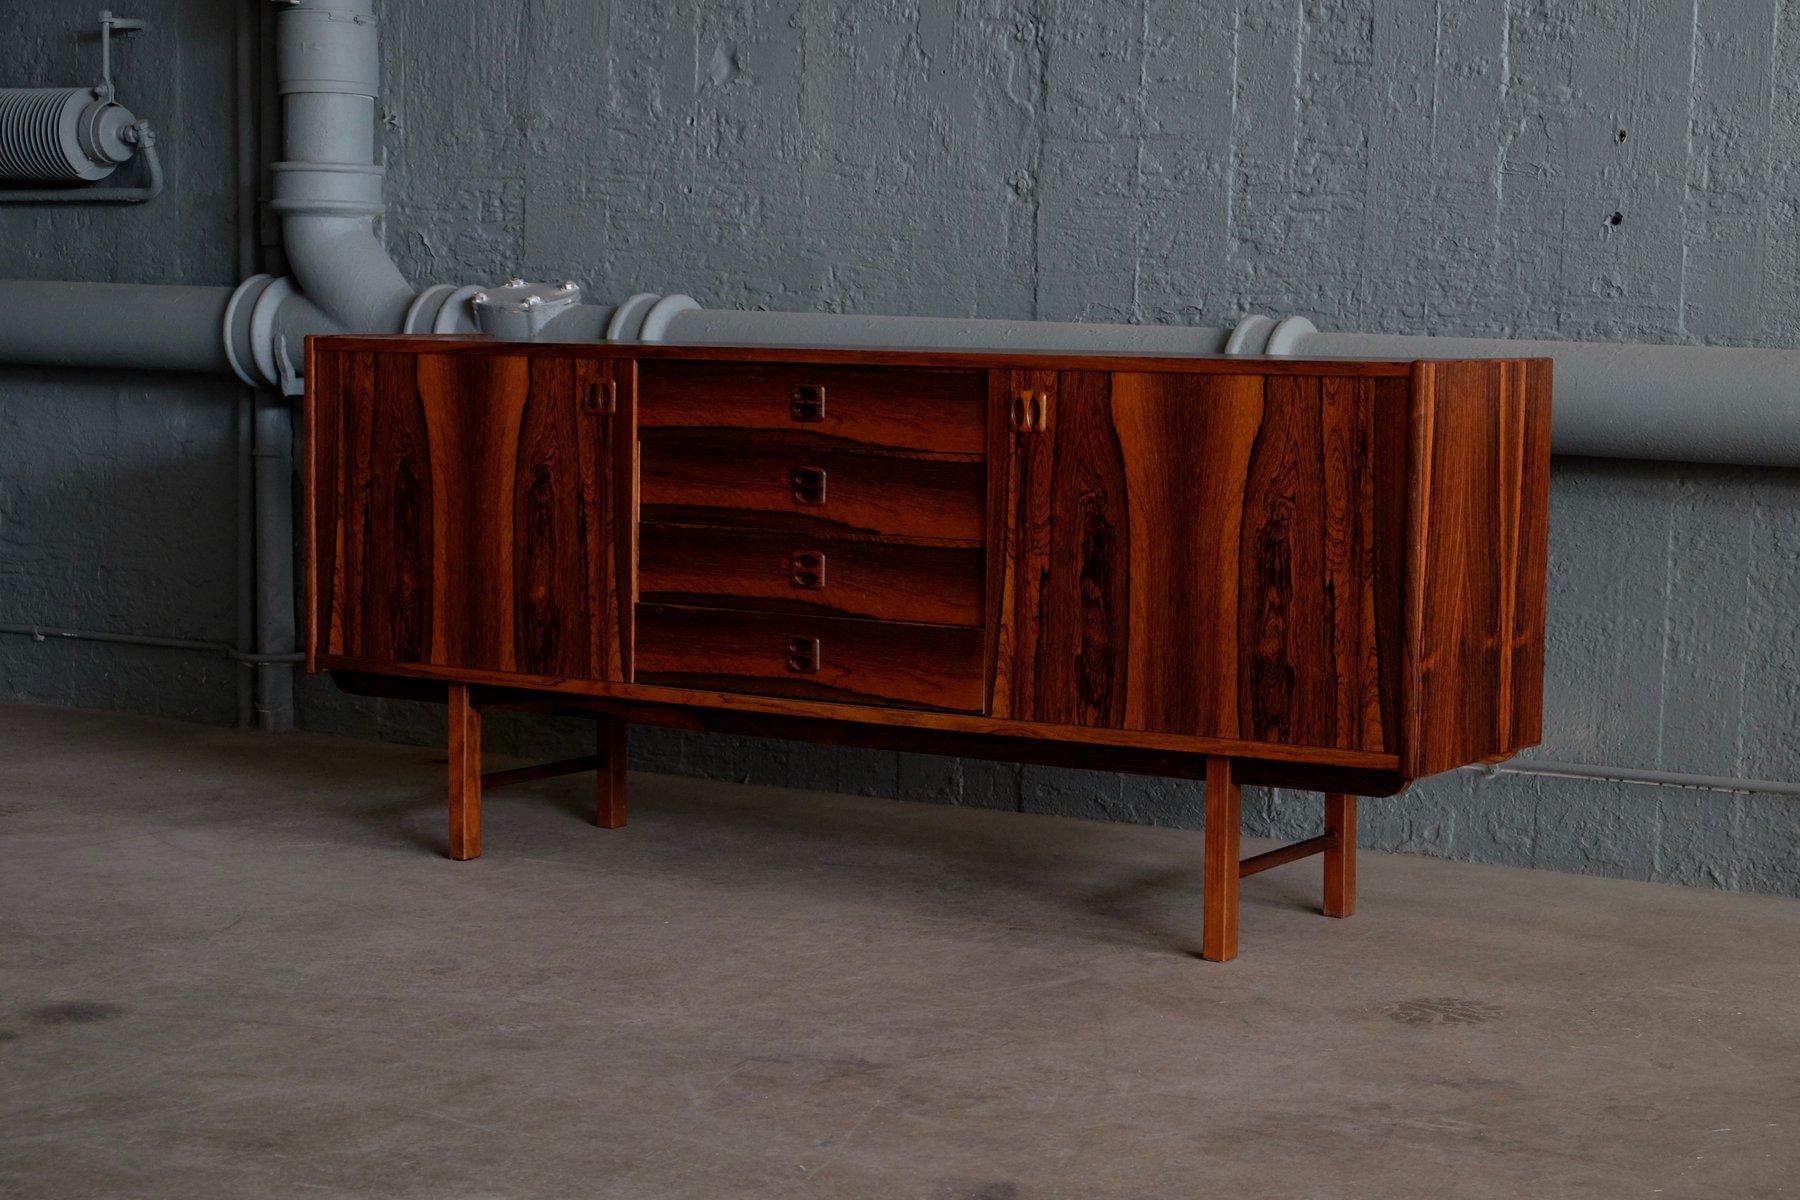 Ikea Ivar Credenza : Vintage sideboard ikea remodelaholic transform cubbies into